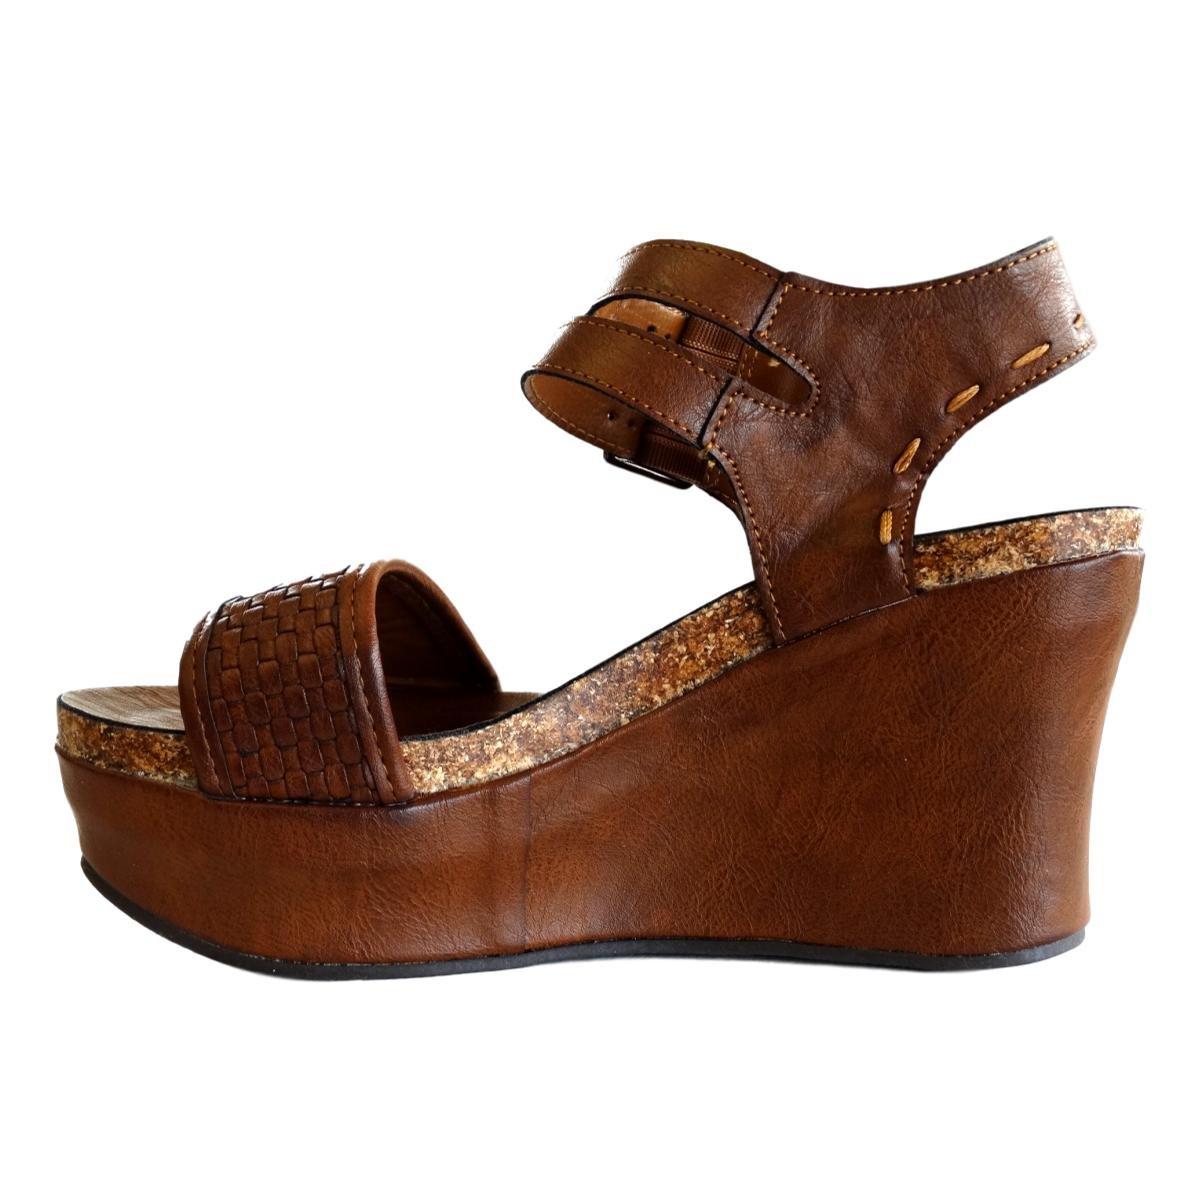 cecdceefaa Amazon.com   Pierre Dumas Hester-12 Women's Vegan Leather Double-Buckle  Rounded-Toe Wedge Sandals   Sandals